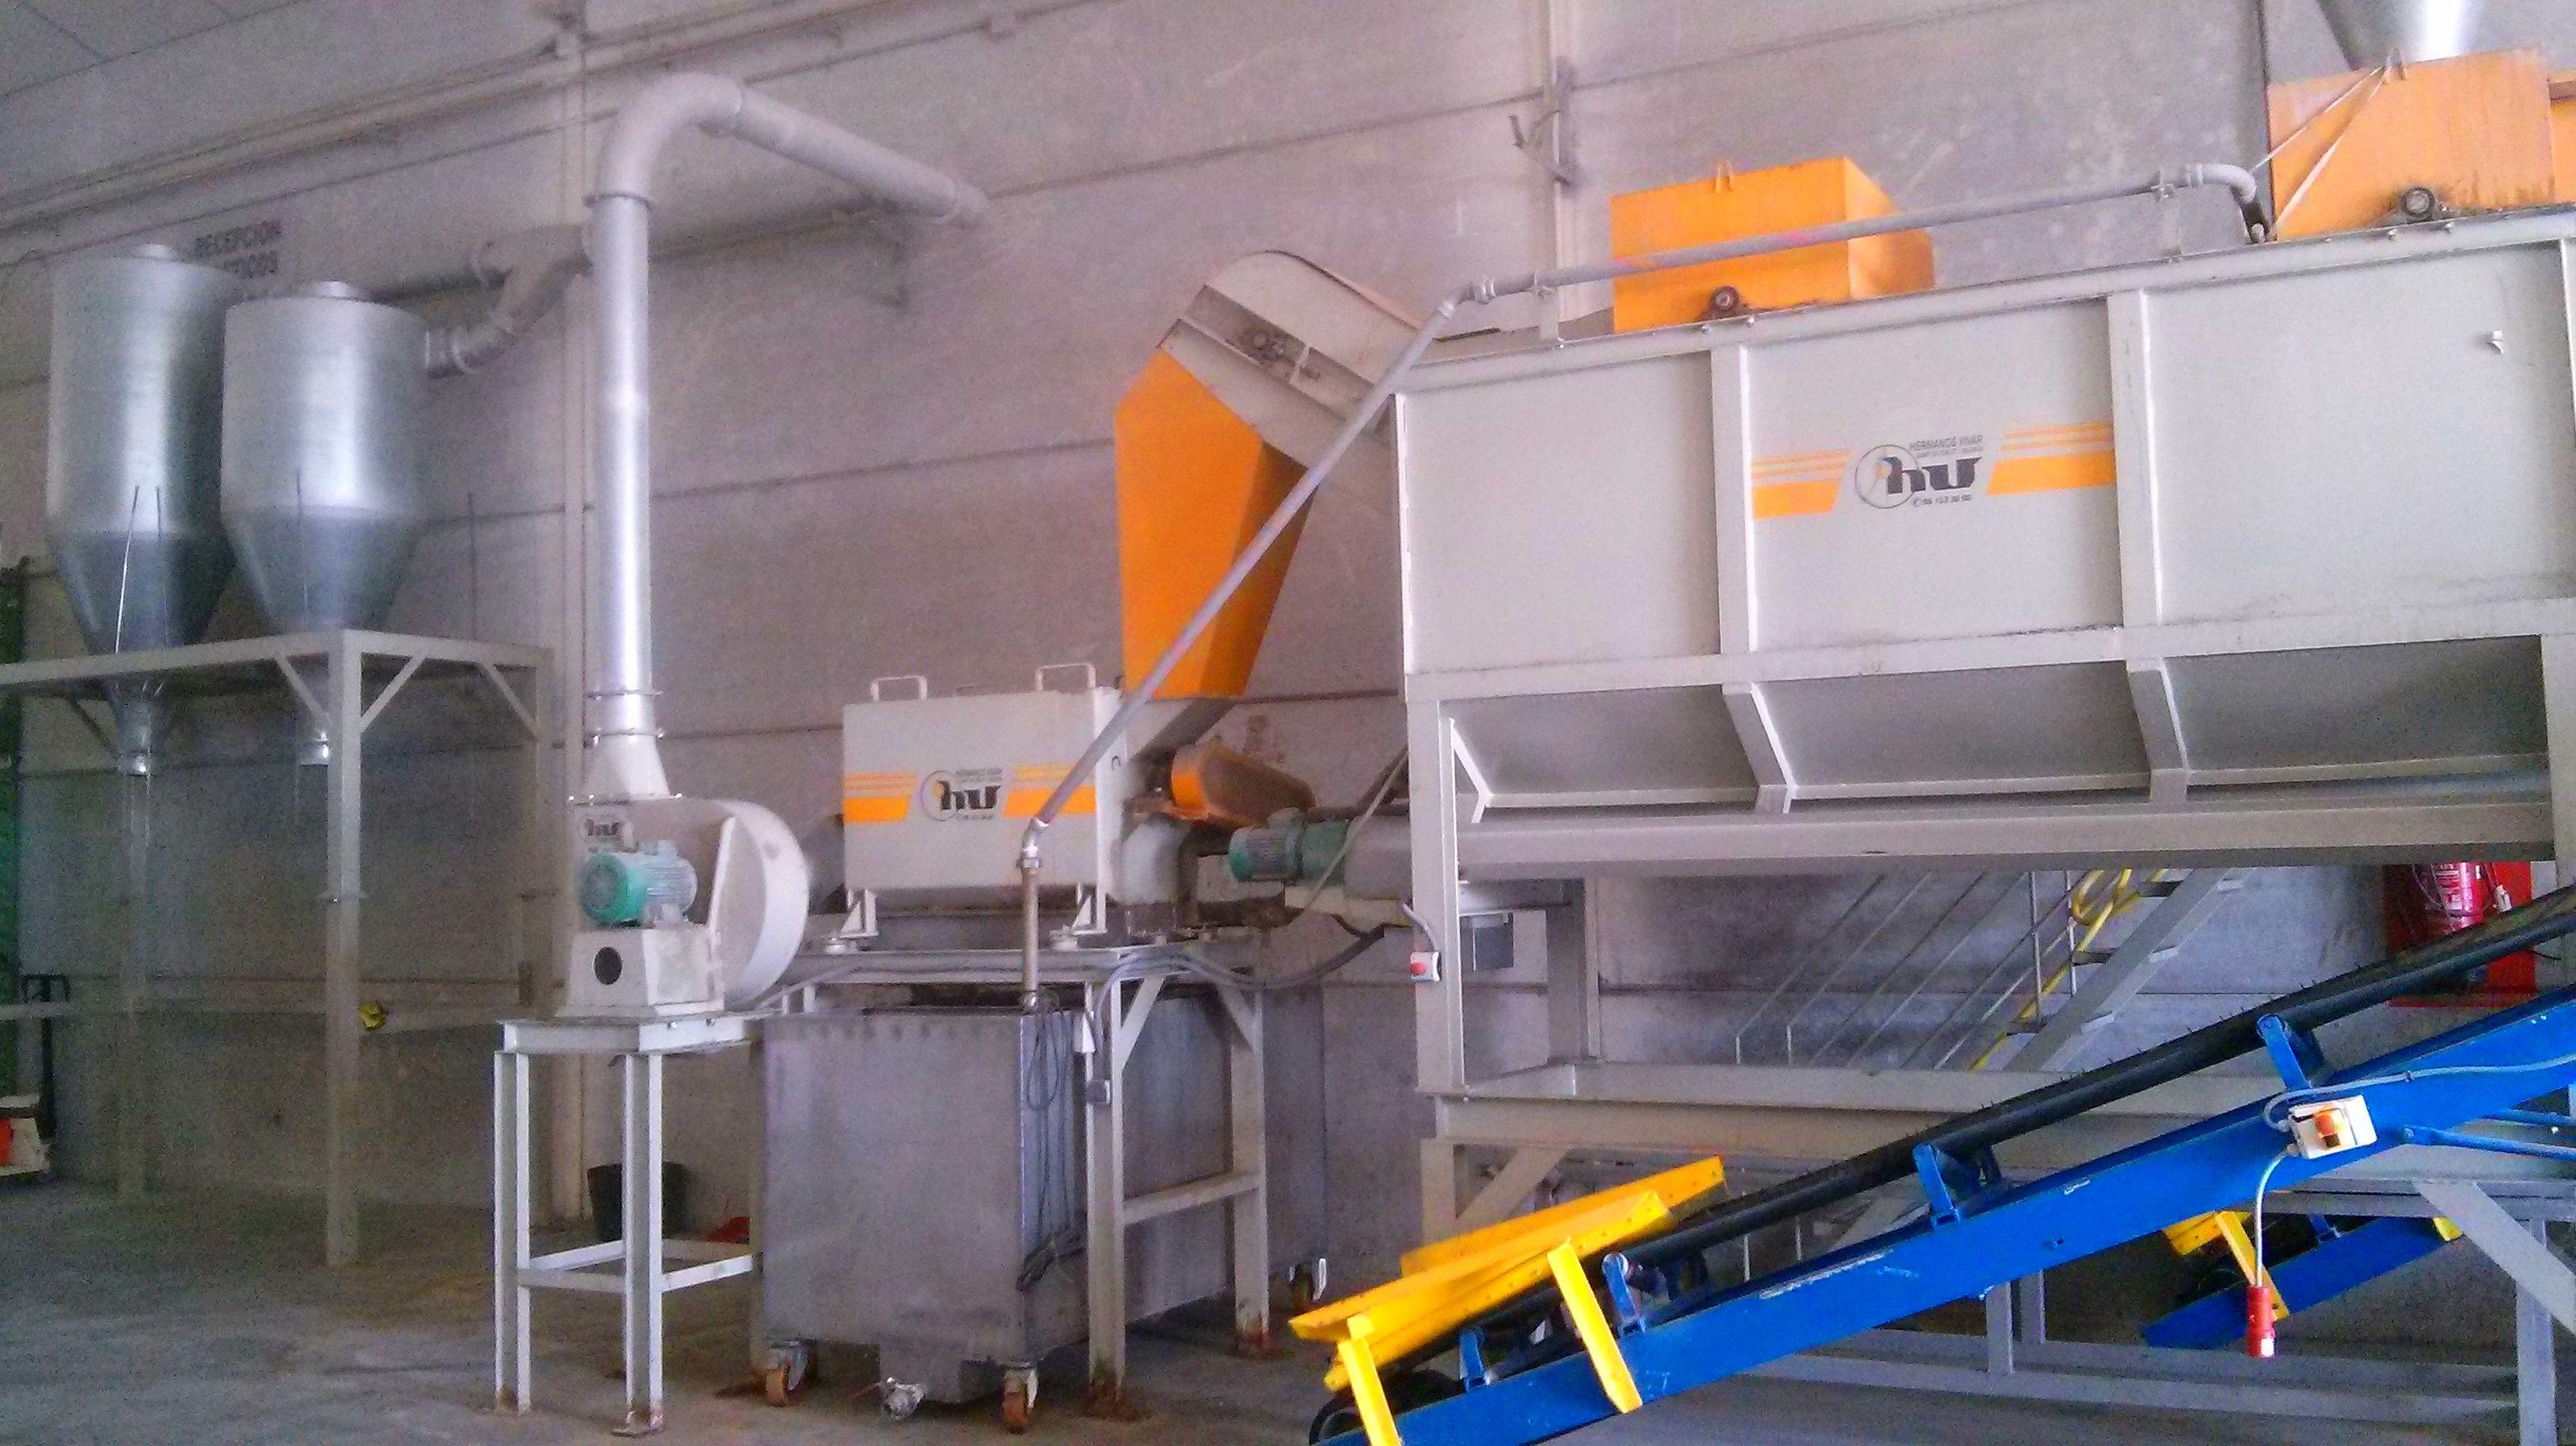 Foto 12 de Reciclaje de residuos en Manises | PalePlast, S. L.